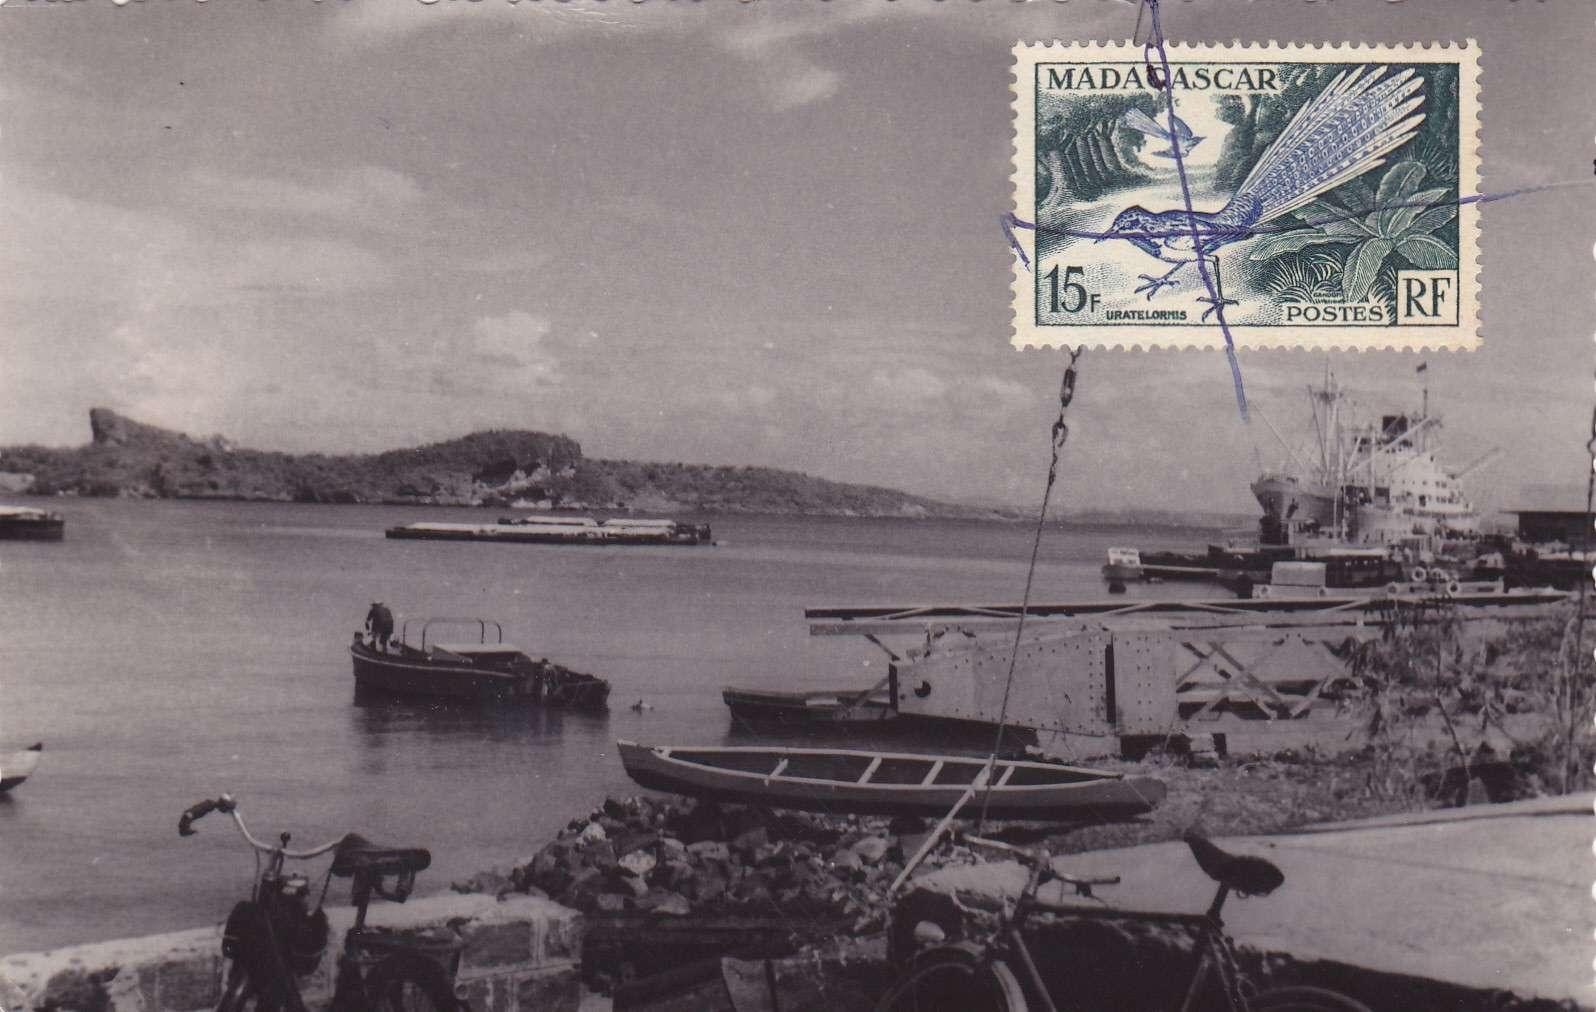 [Divers campagne Madagascar] CAP DIEGO AU CID 1972 - Page 2 Img_0016